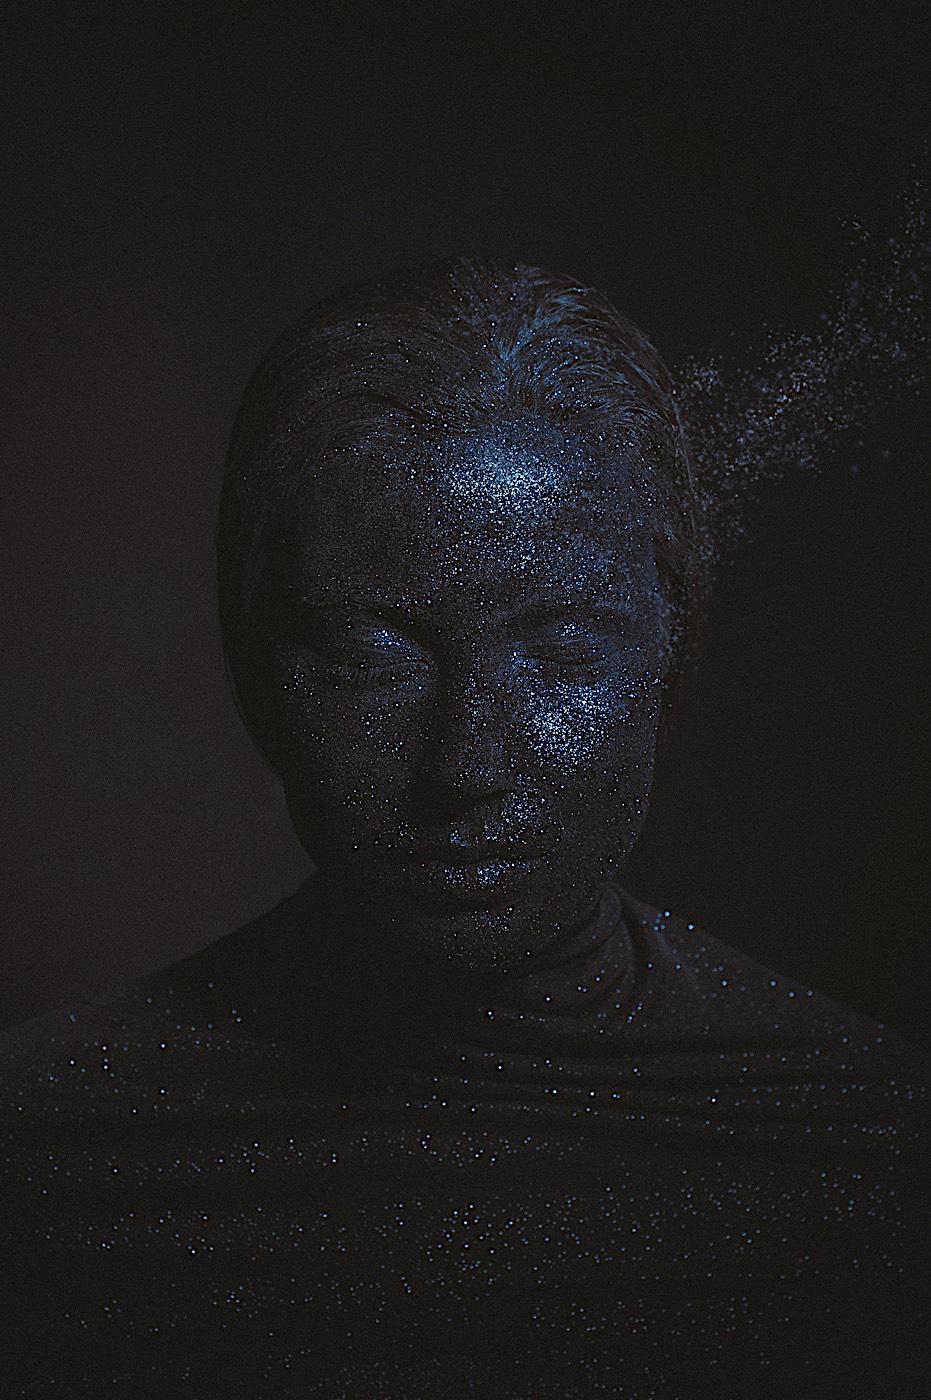 Star dust, 2017